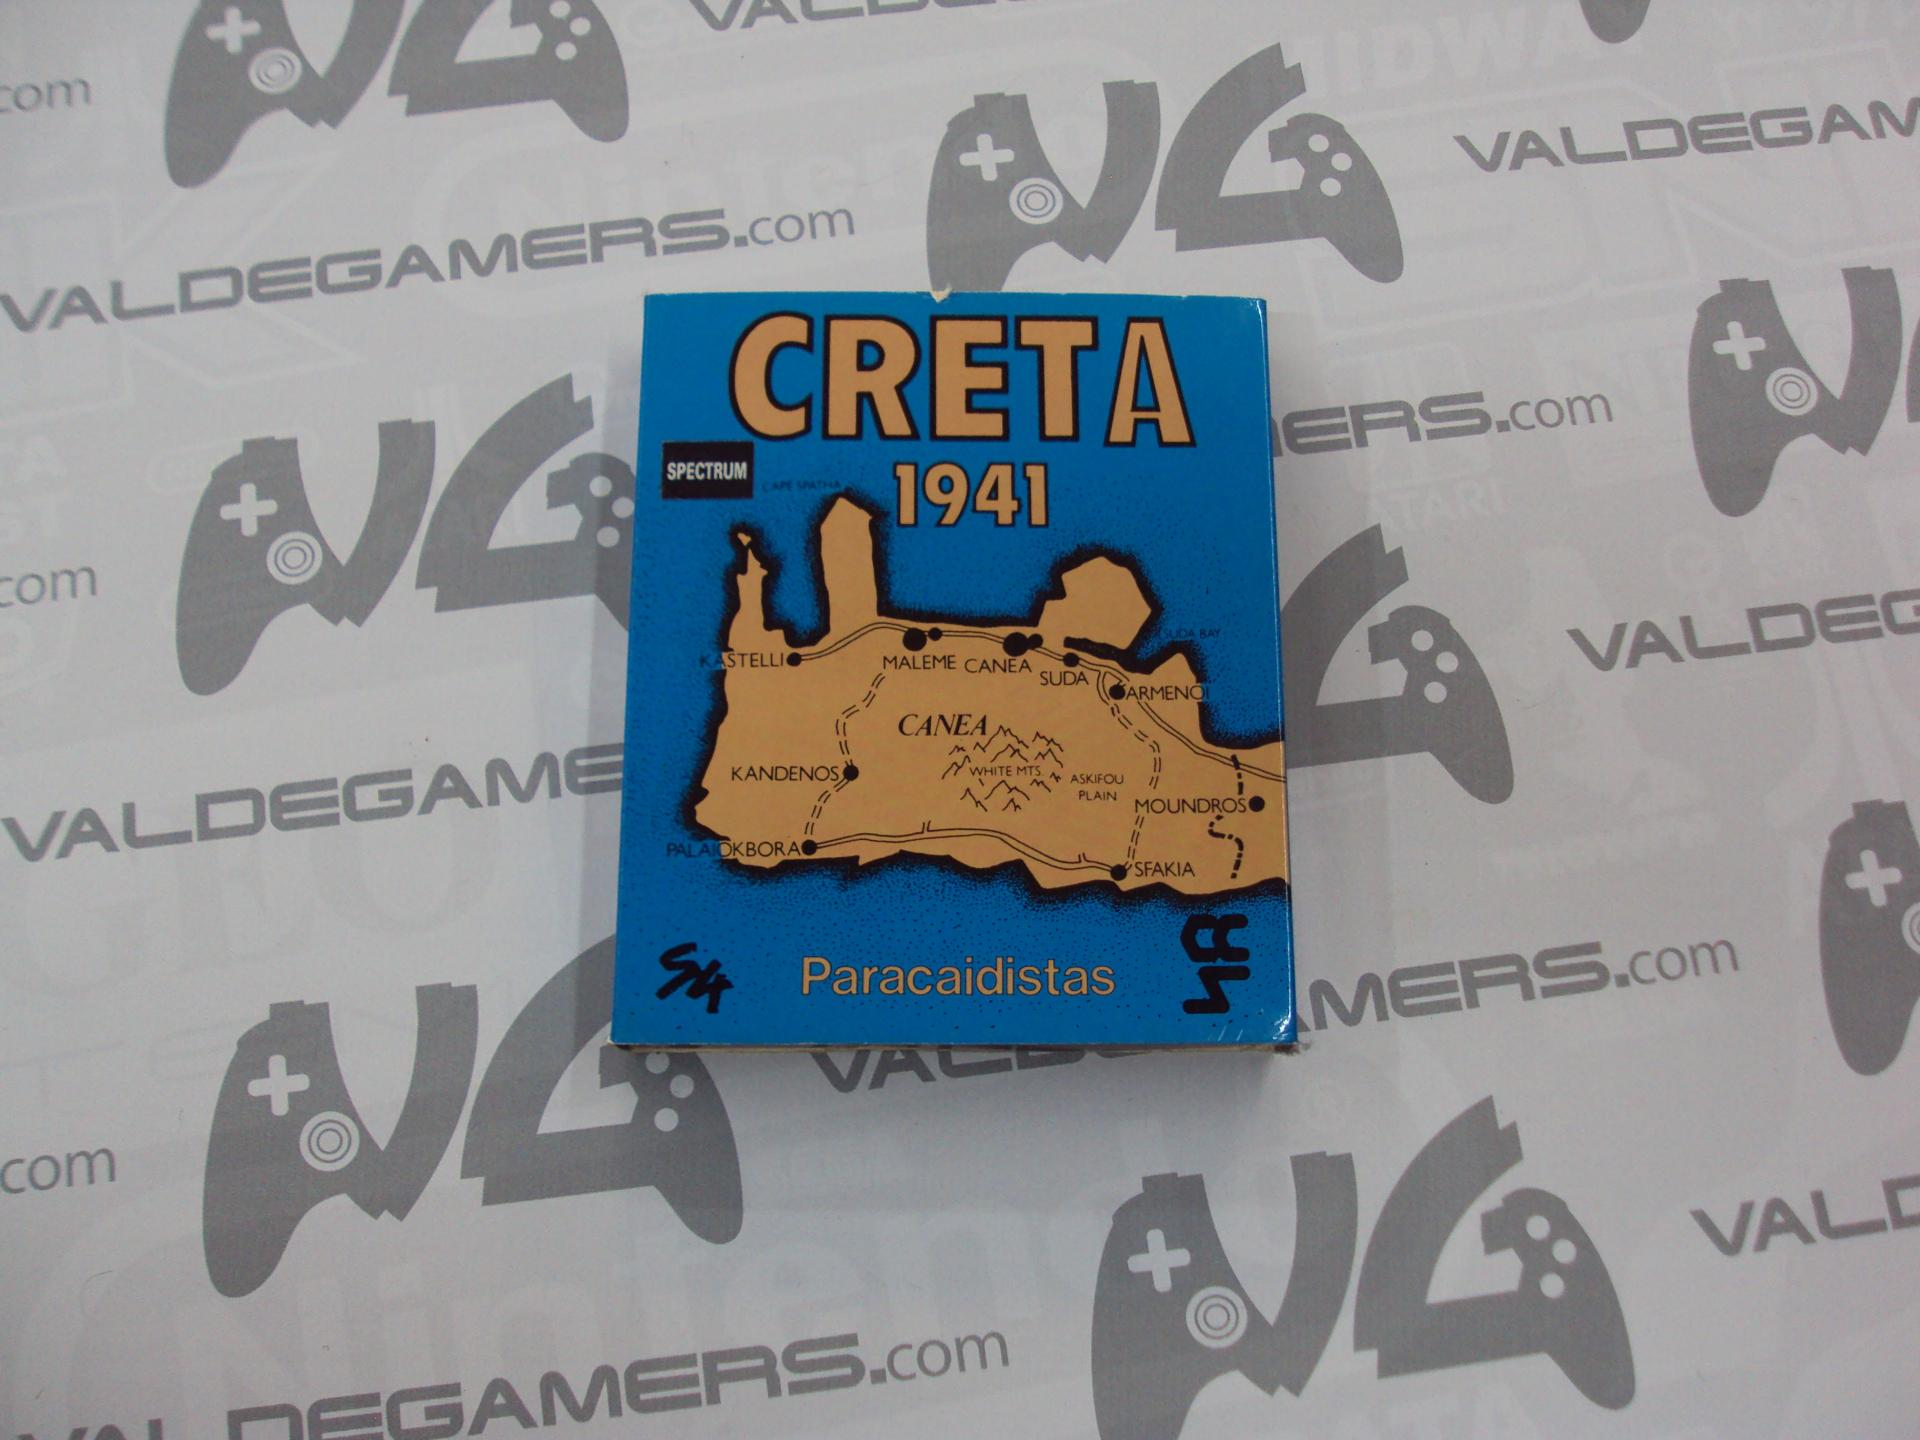 Creta 1941 - paracaidistas